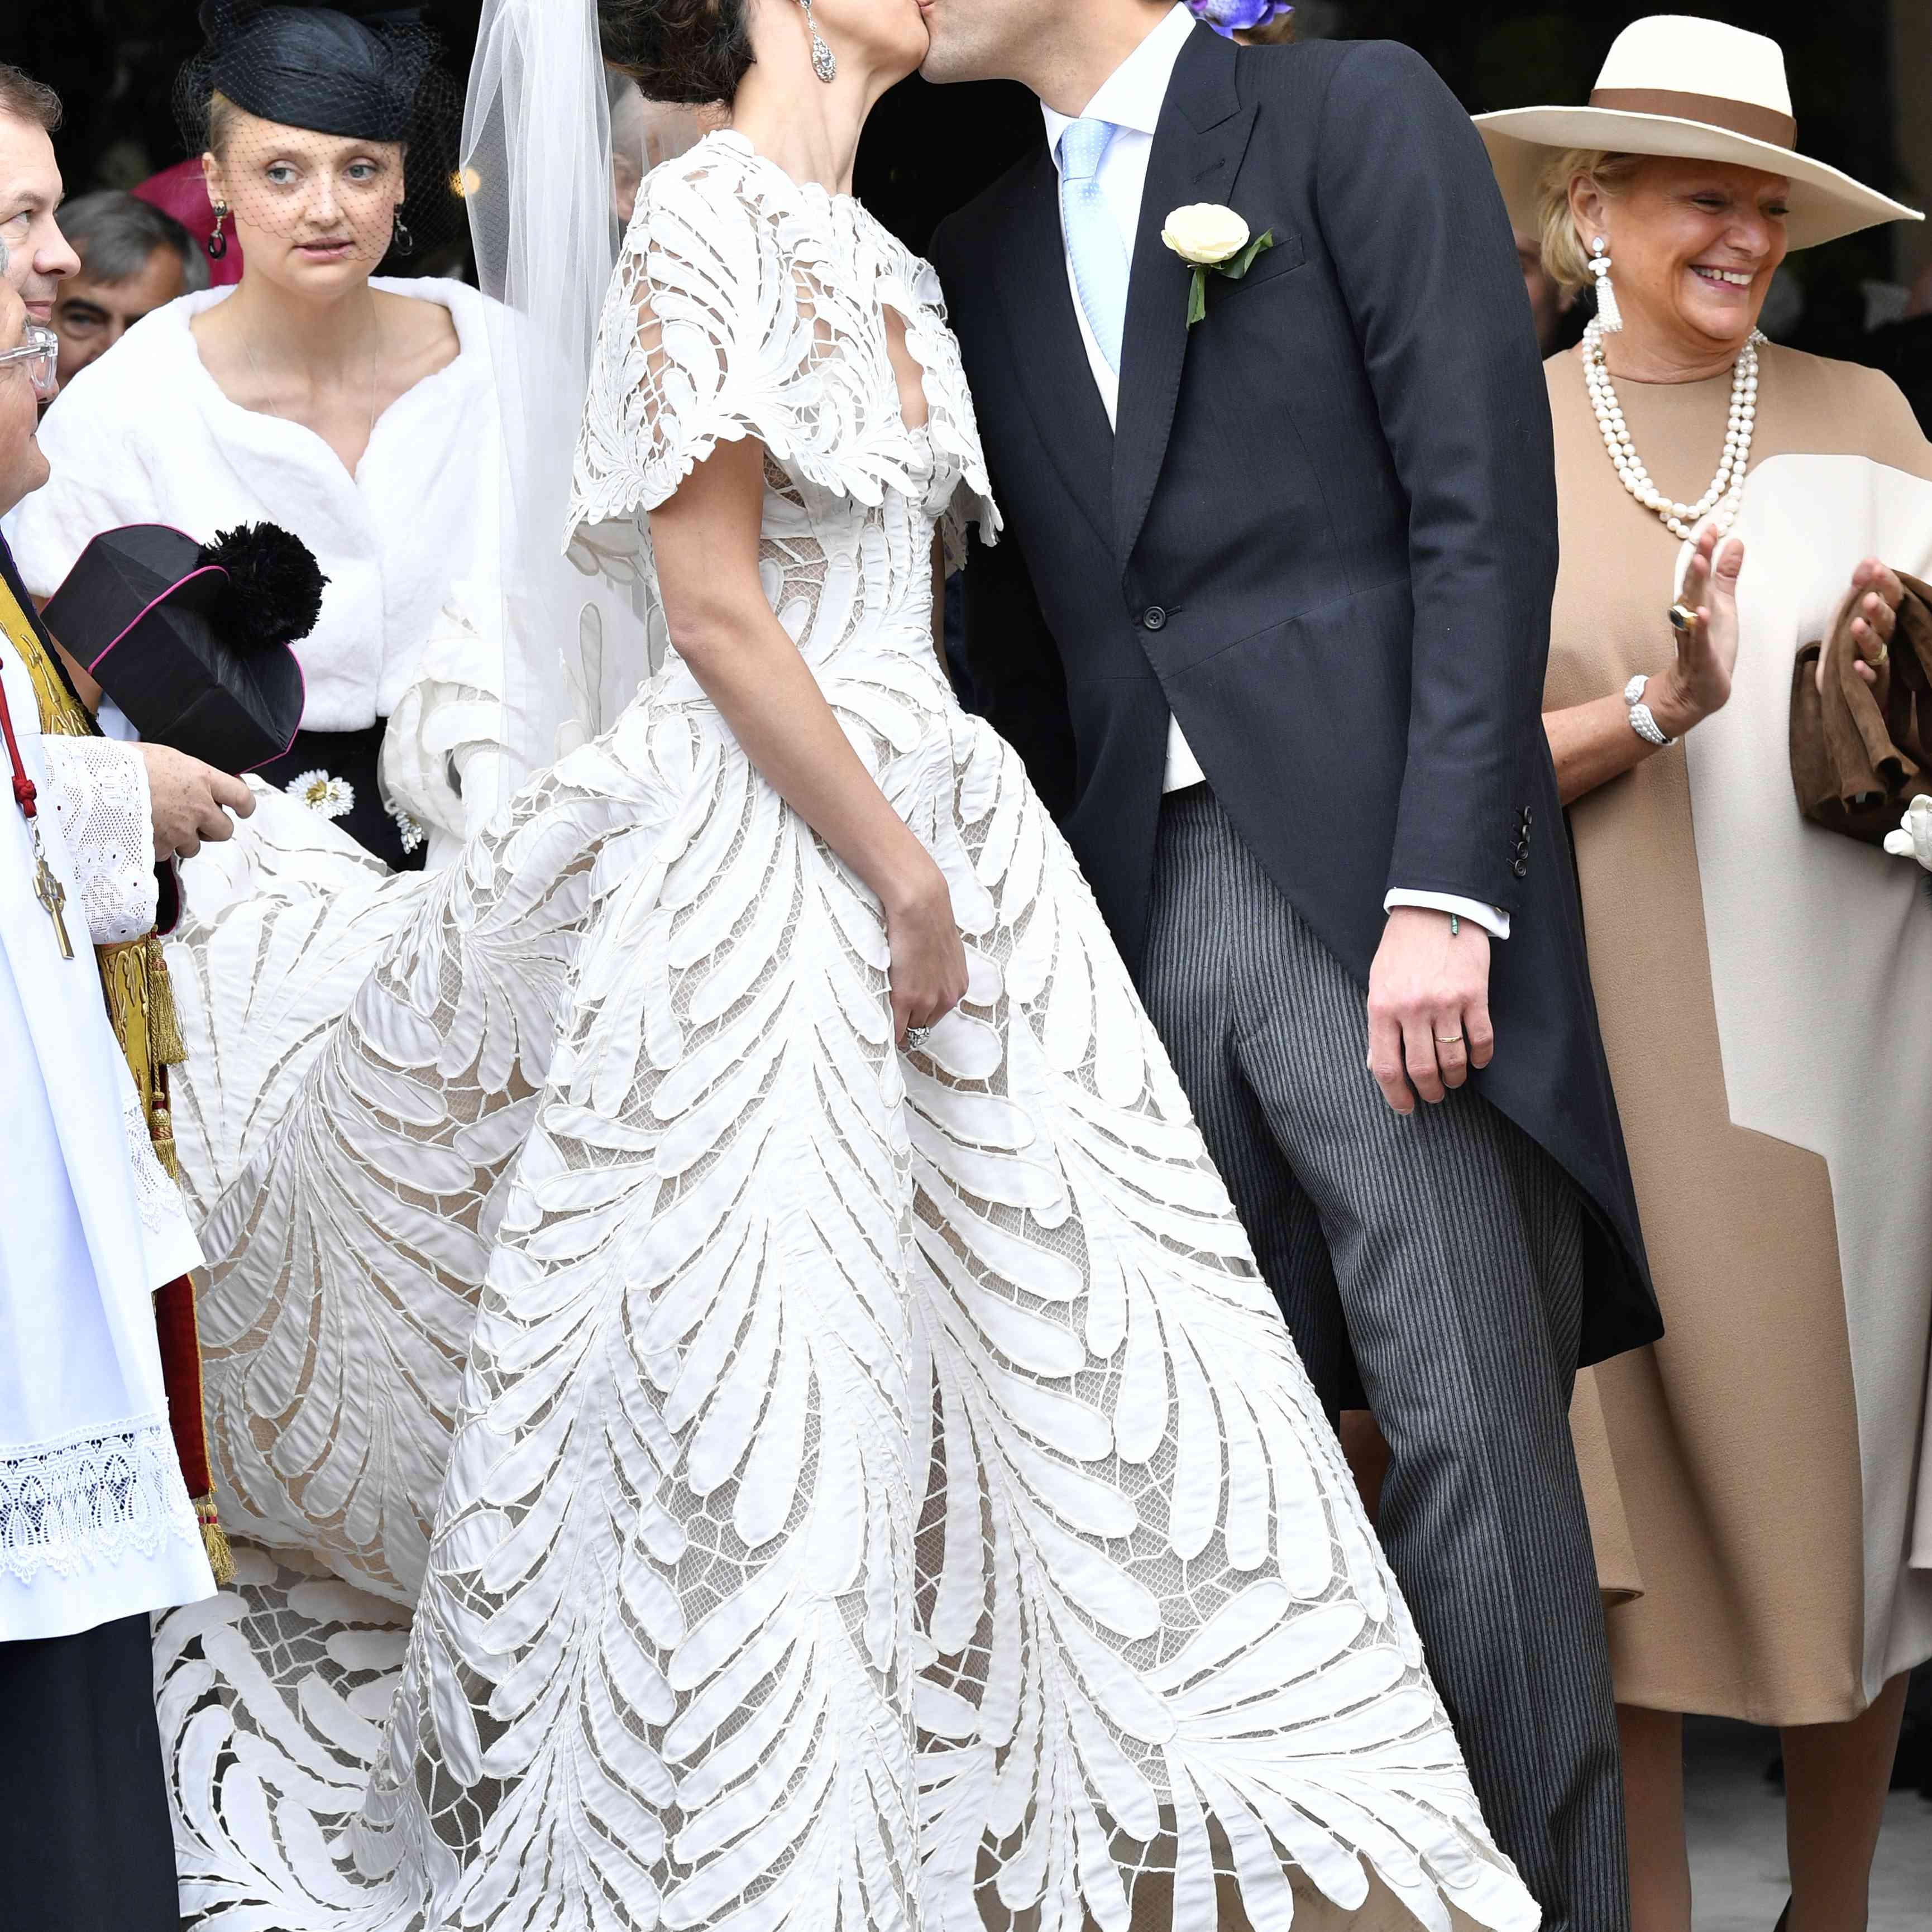 This Bride Wore The Prettiest Oscar De La Renta Dress At Her